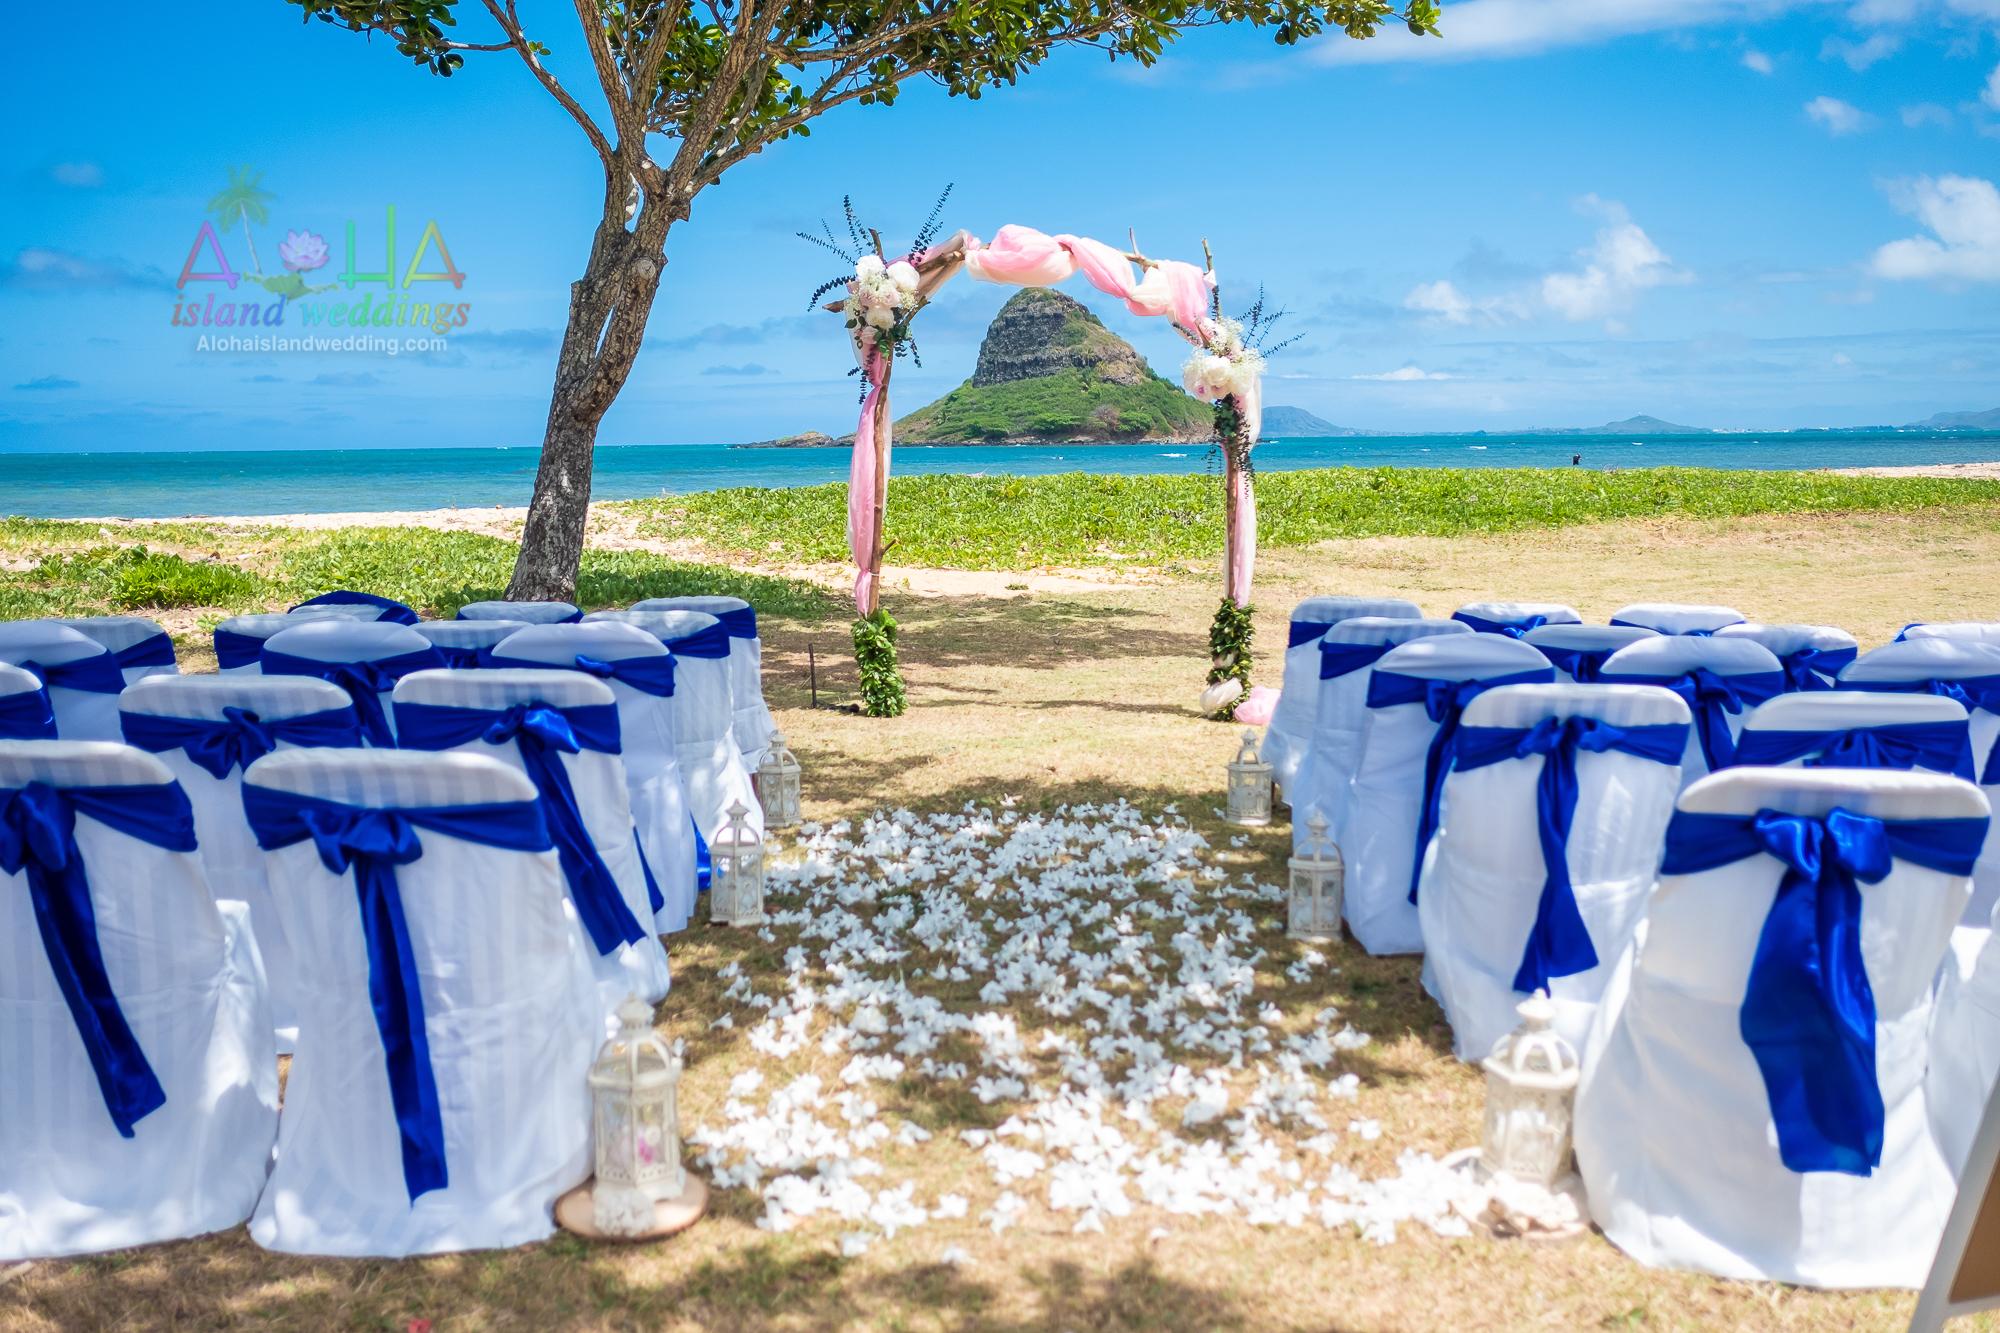 Hawaii weddings and events, Kualoa-6